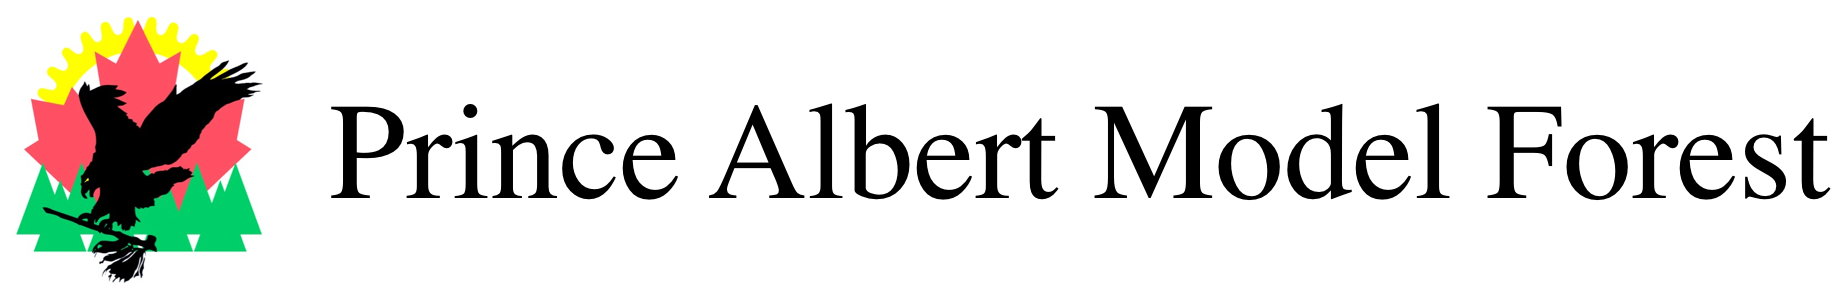 Prince Albert Model Forest